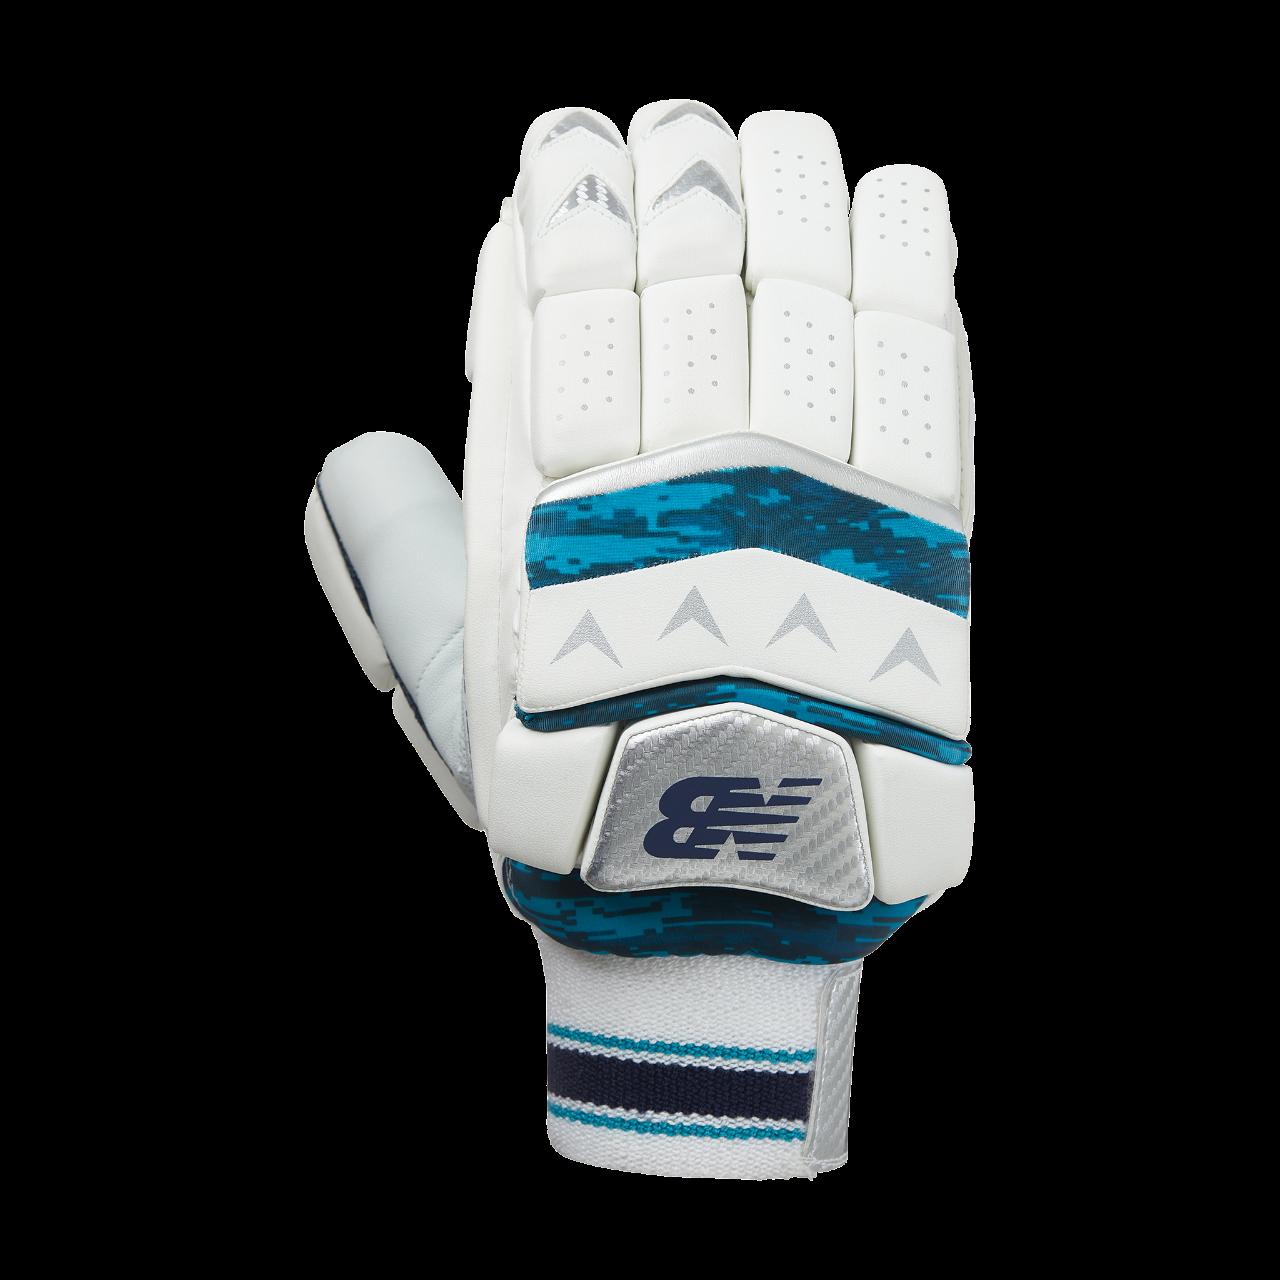 new balance baseball gloves Cheaper Than Retail Price> Buy ...